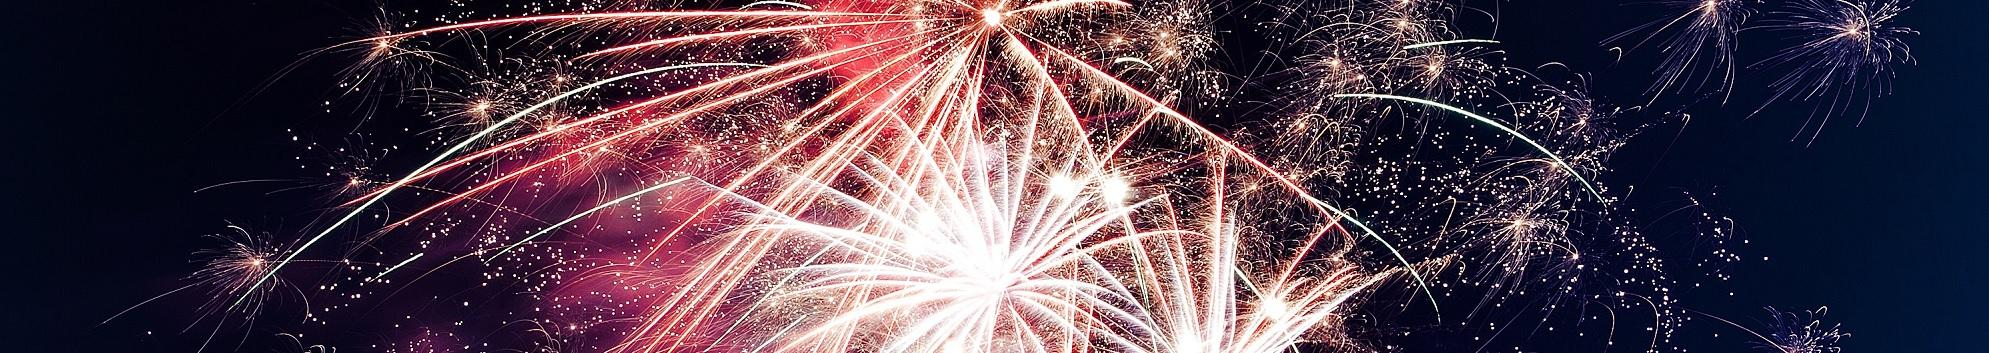 Image of multiple fireworks exploding